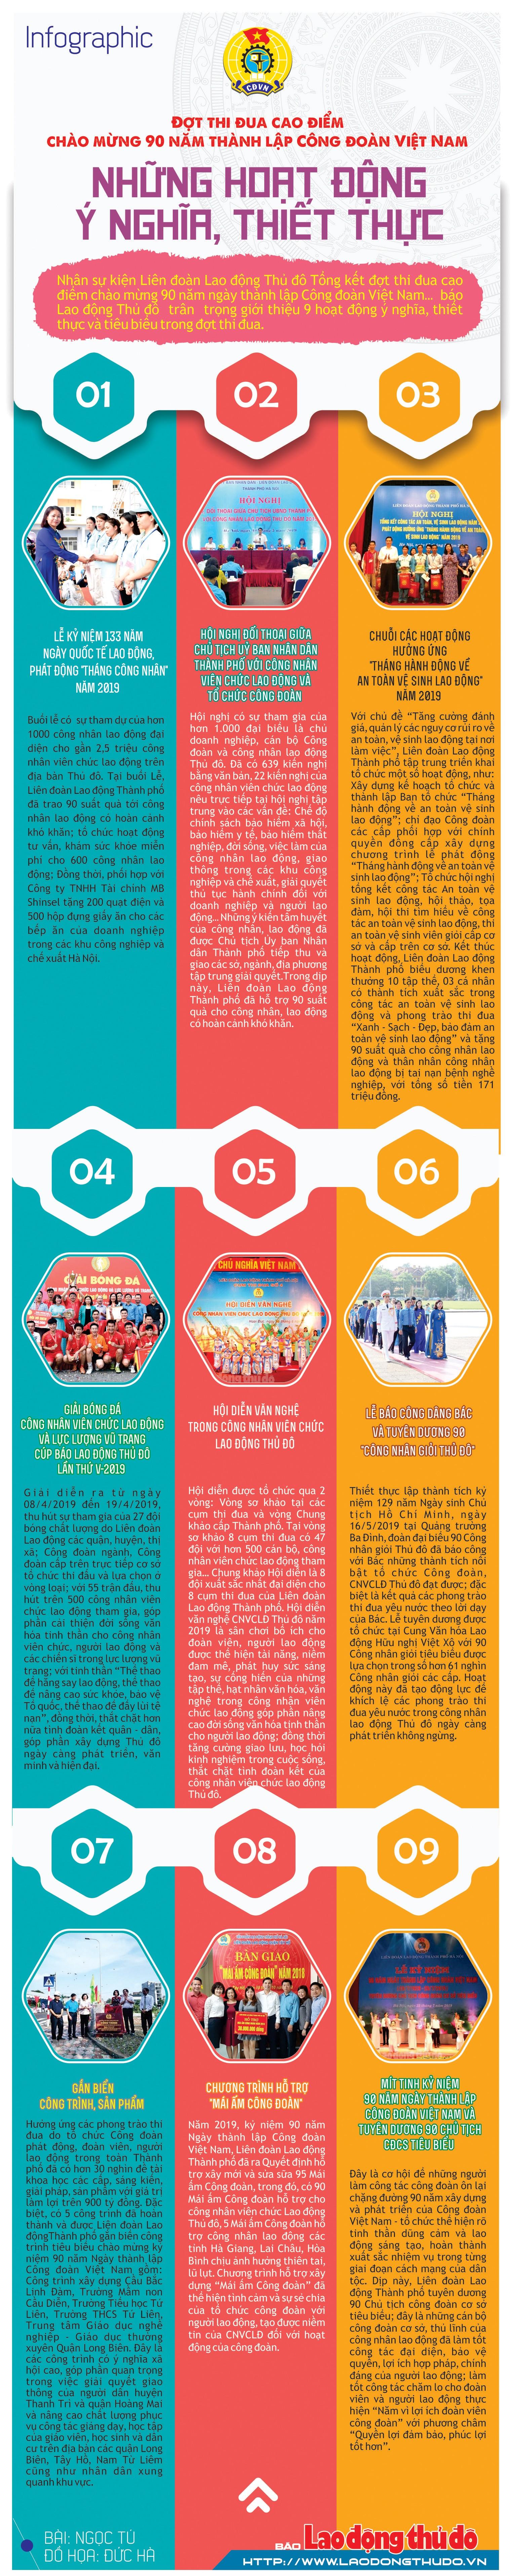 infographic thi dua cao diem chao mung 90 nam thanh lap cong doan viet nam